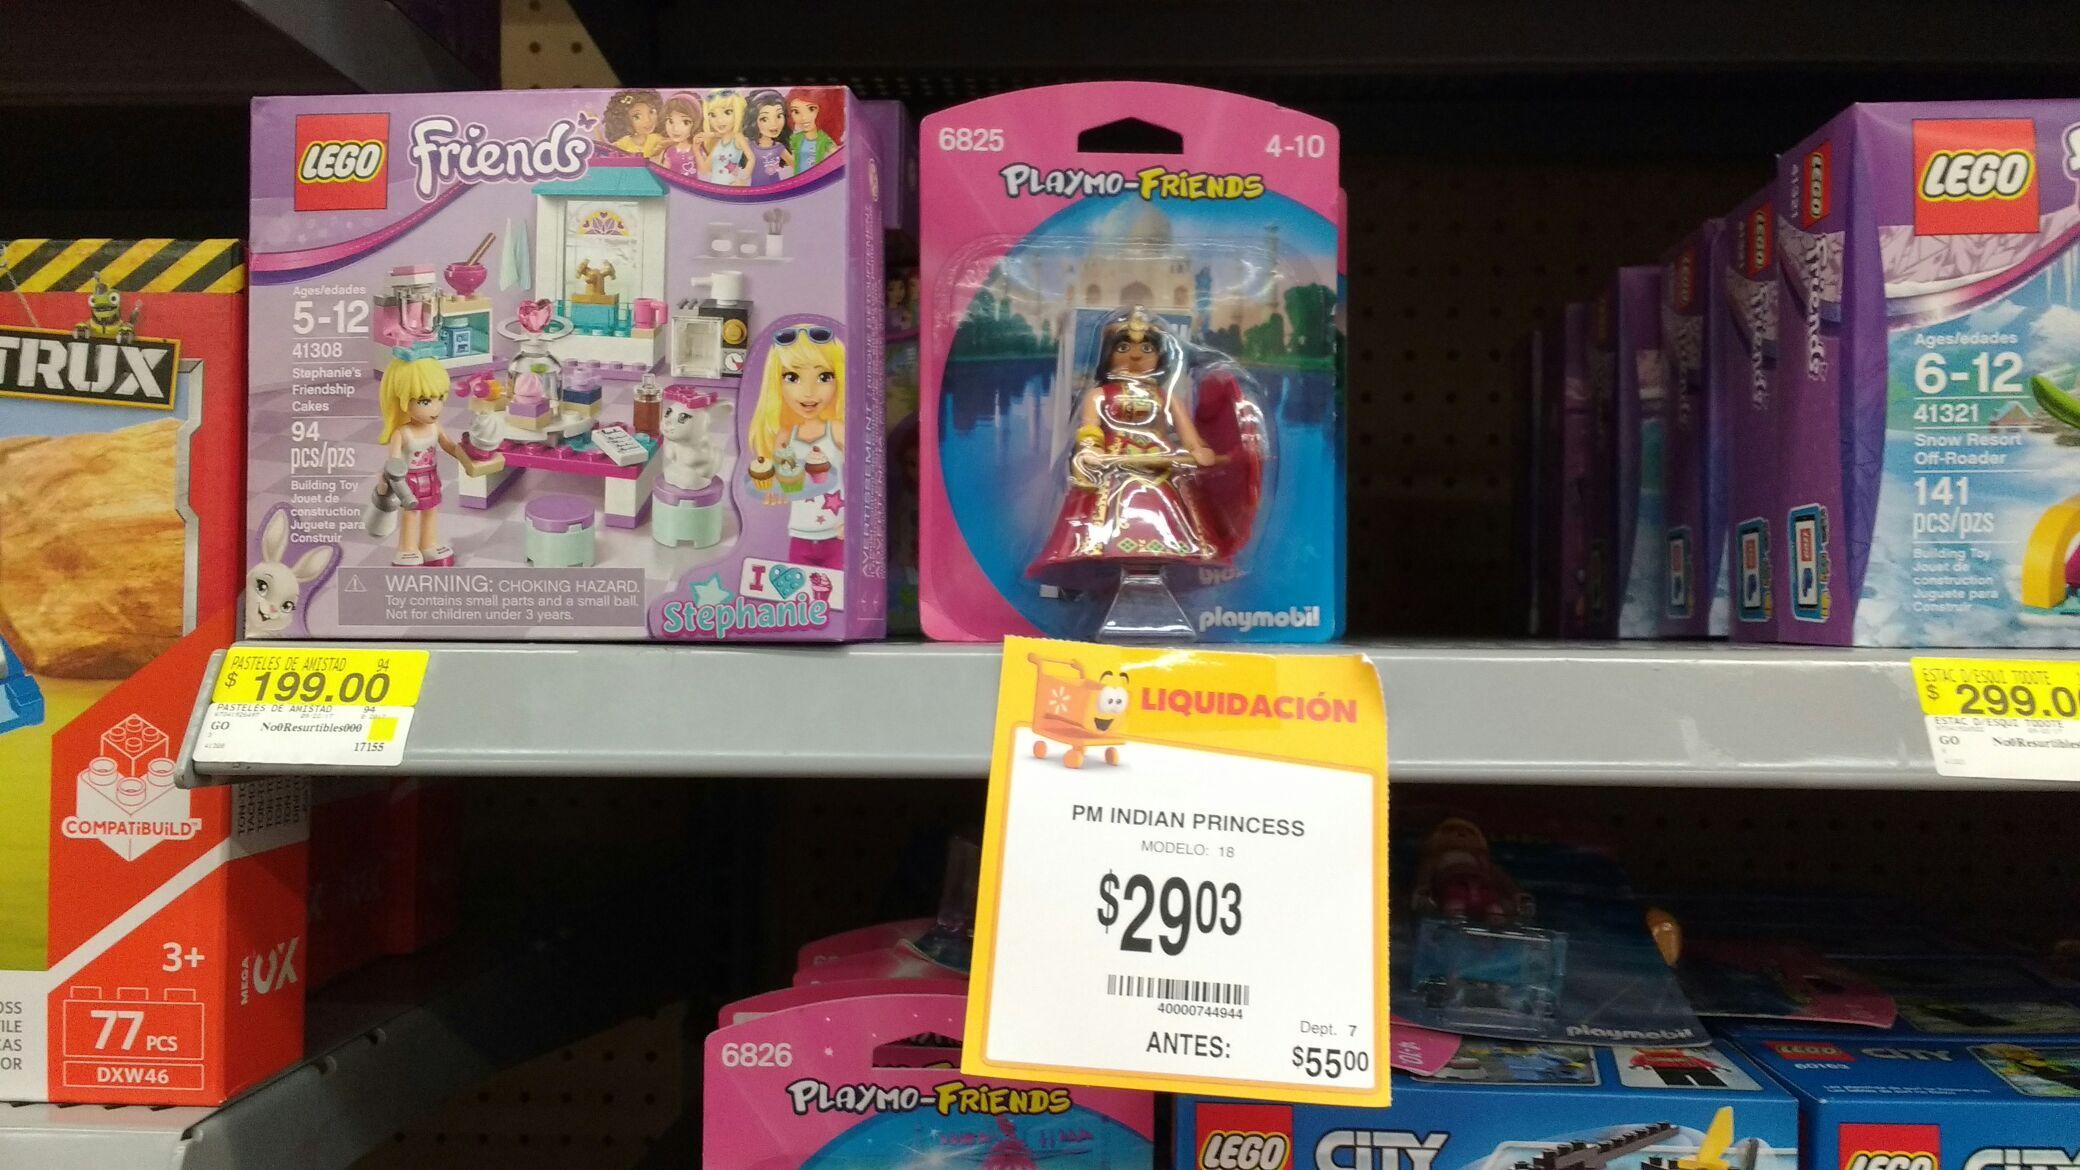 Walmart Tecnológico, Colima: Playmobil friends